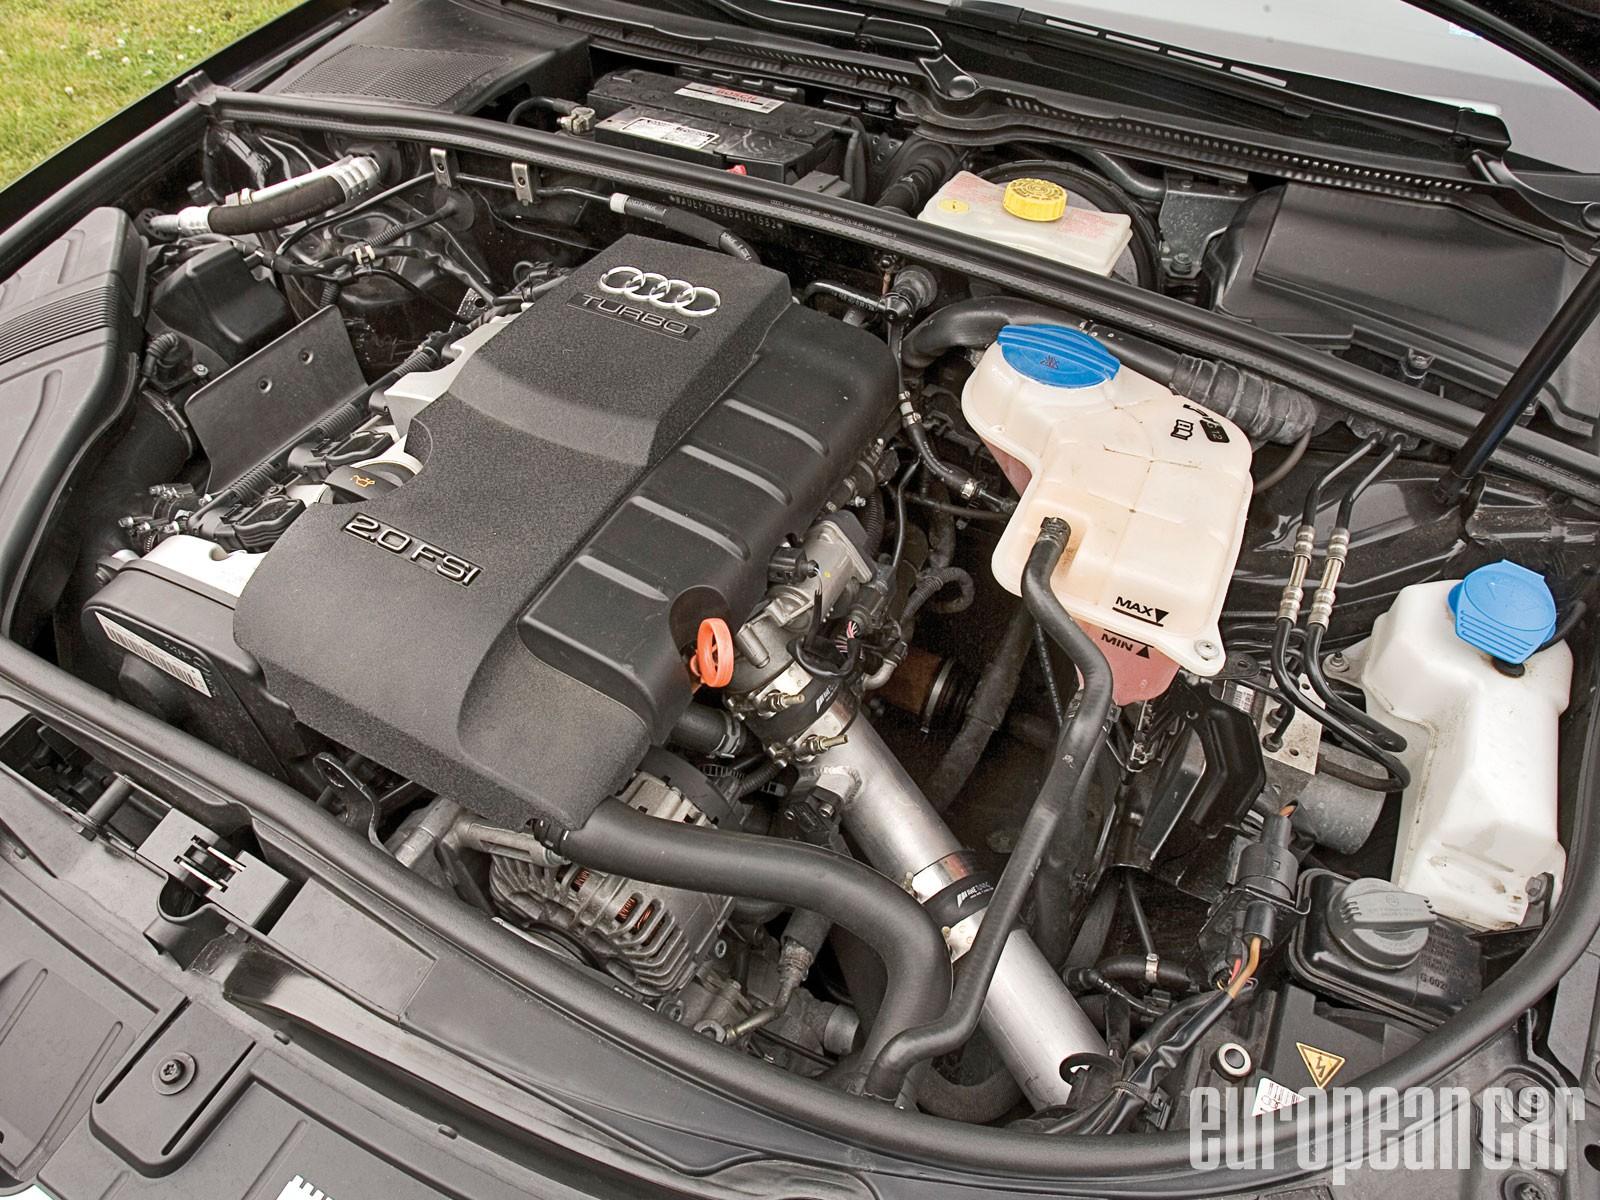 Audi 1 8 T Engine Diagram Audi A4 Price Modifications Pictures Moibibiki Of Audi 1 8 T Engine Diagram